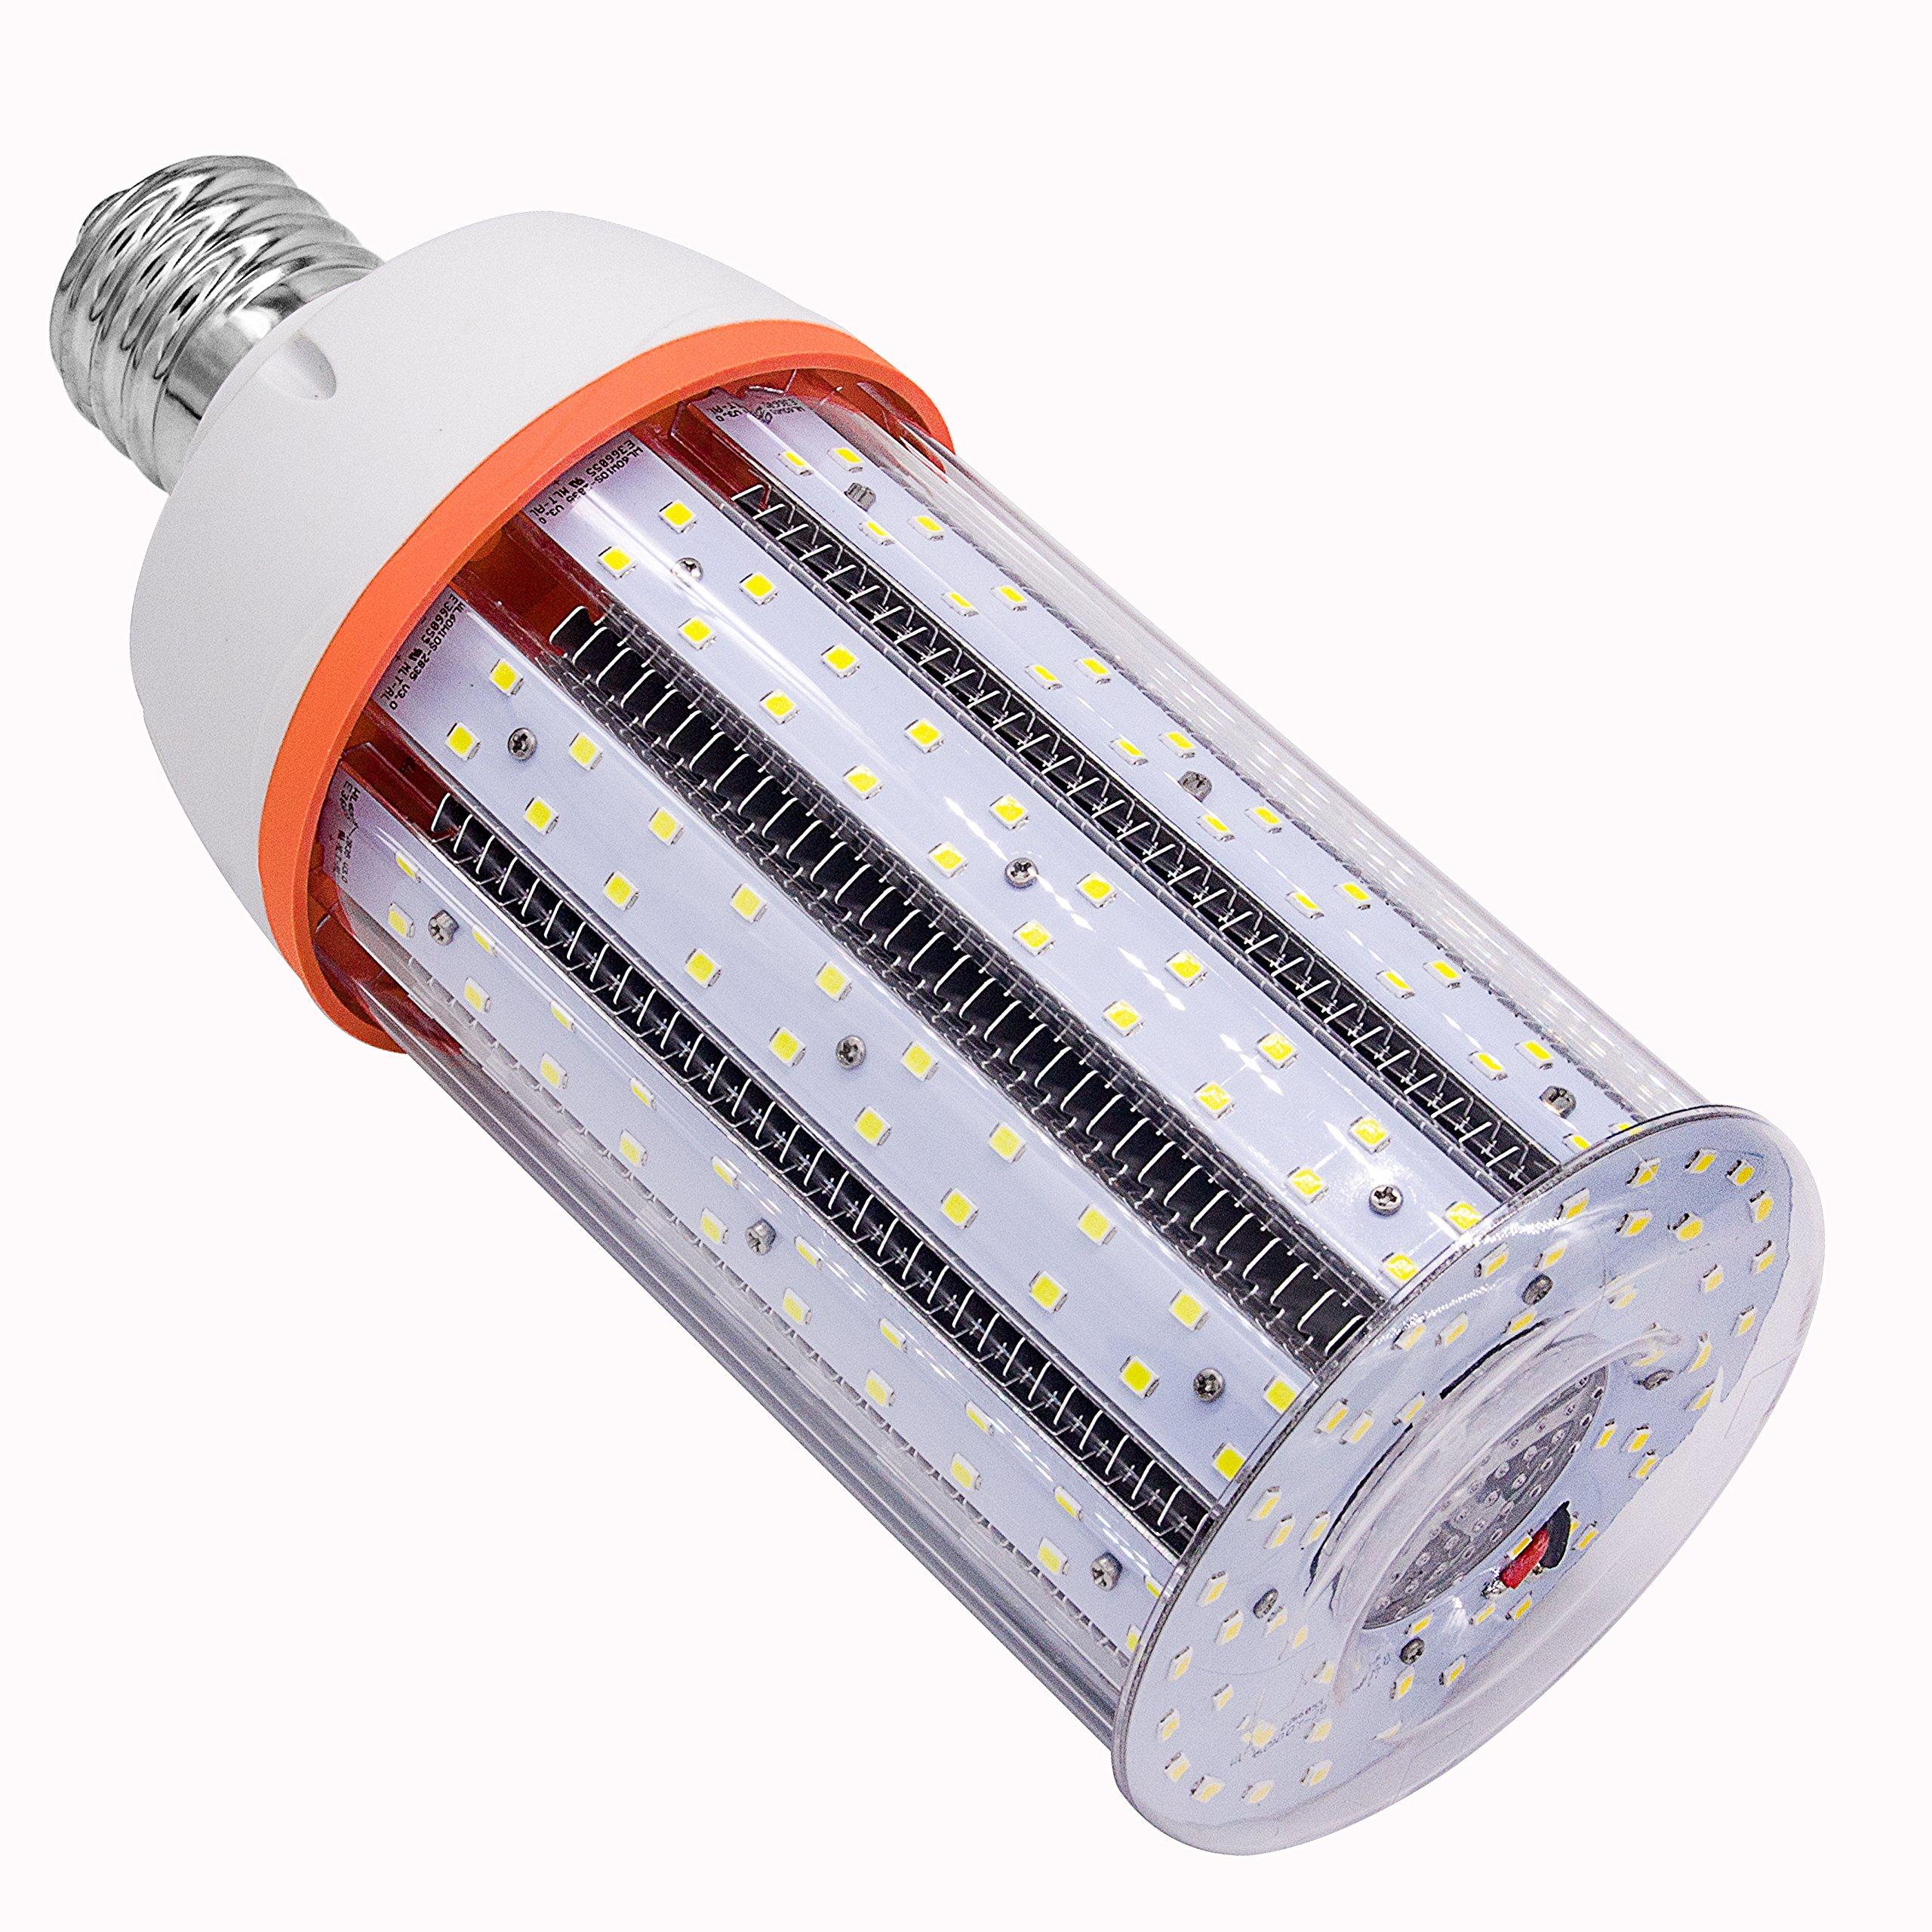 New Sunshine 60W LED Corn Light Bulb E39 Mogule Base 8600LM 5000K Cool White UL&DLC Certified for Low Bay Street Lamp Post Lighting Garage Factory Warehouse Parking Lot Shopping Mail Supermarket